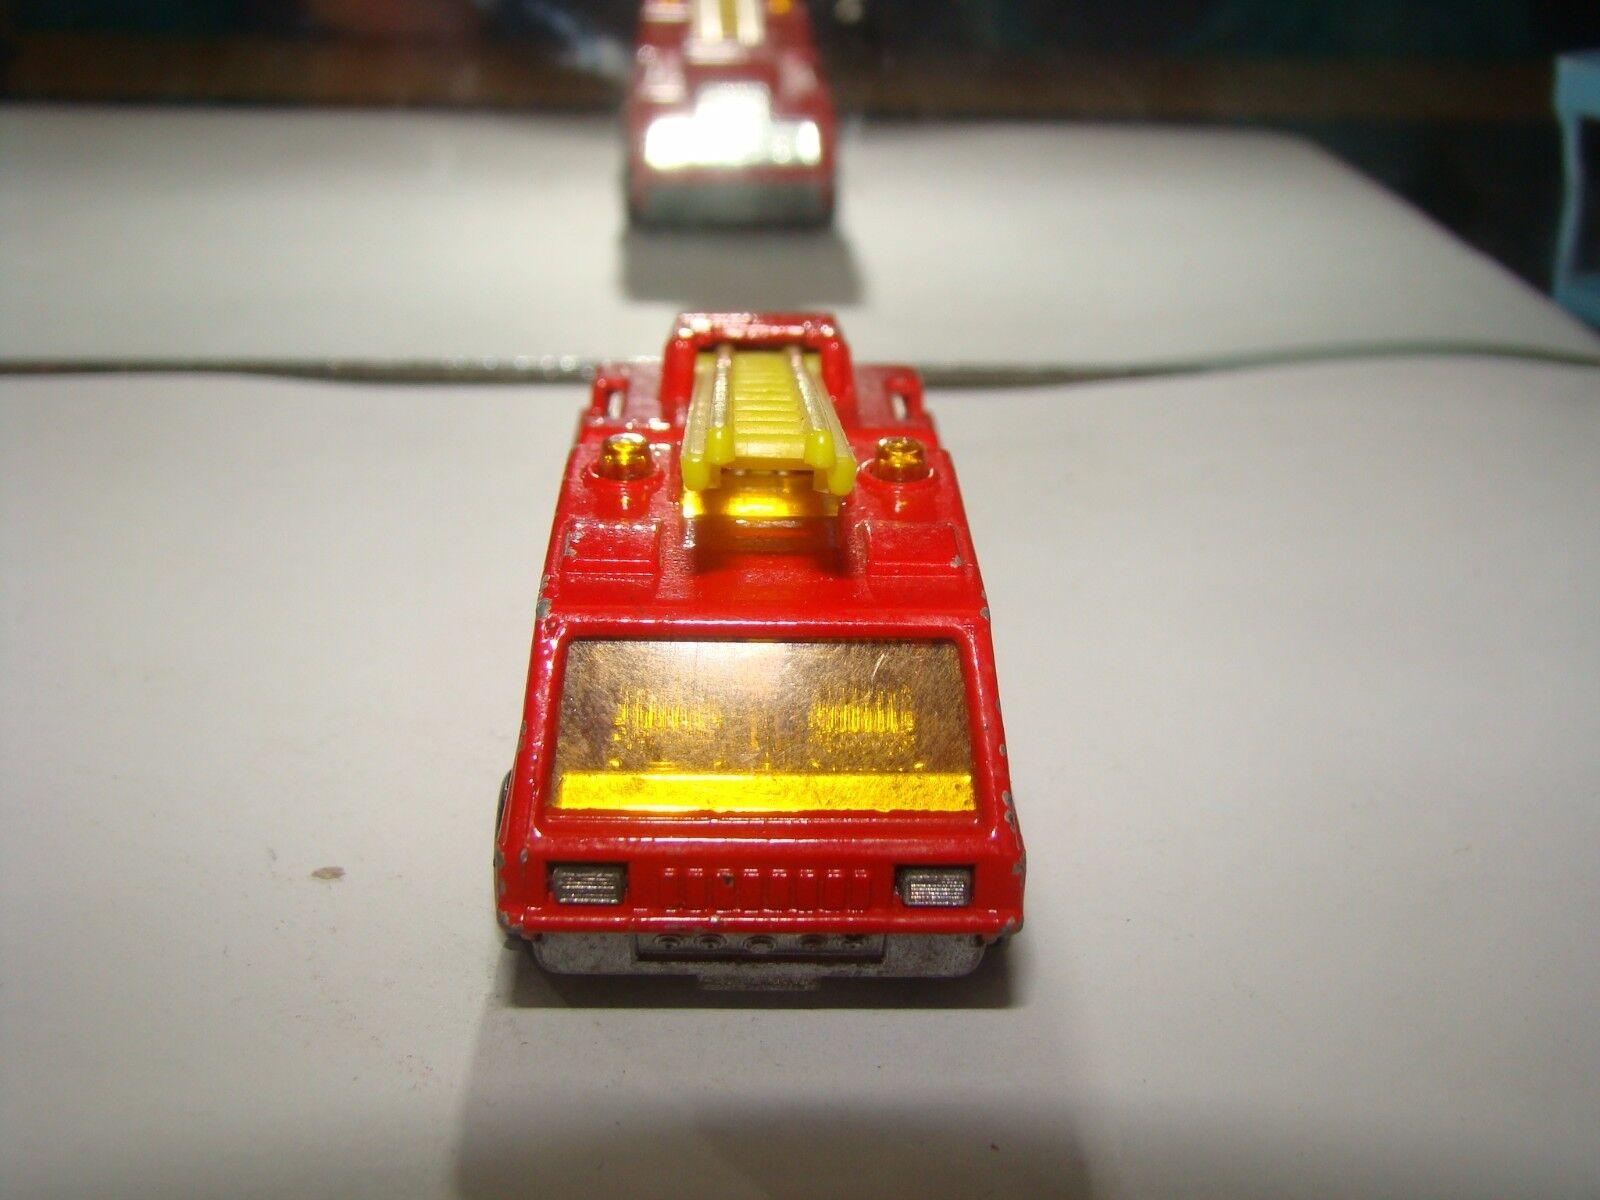 Imbrima inbrima Matchbox 22 Blaze Buster B177